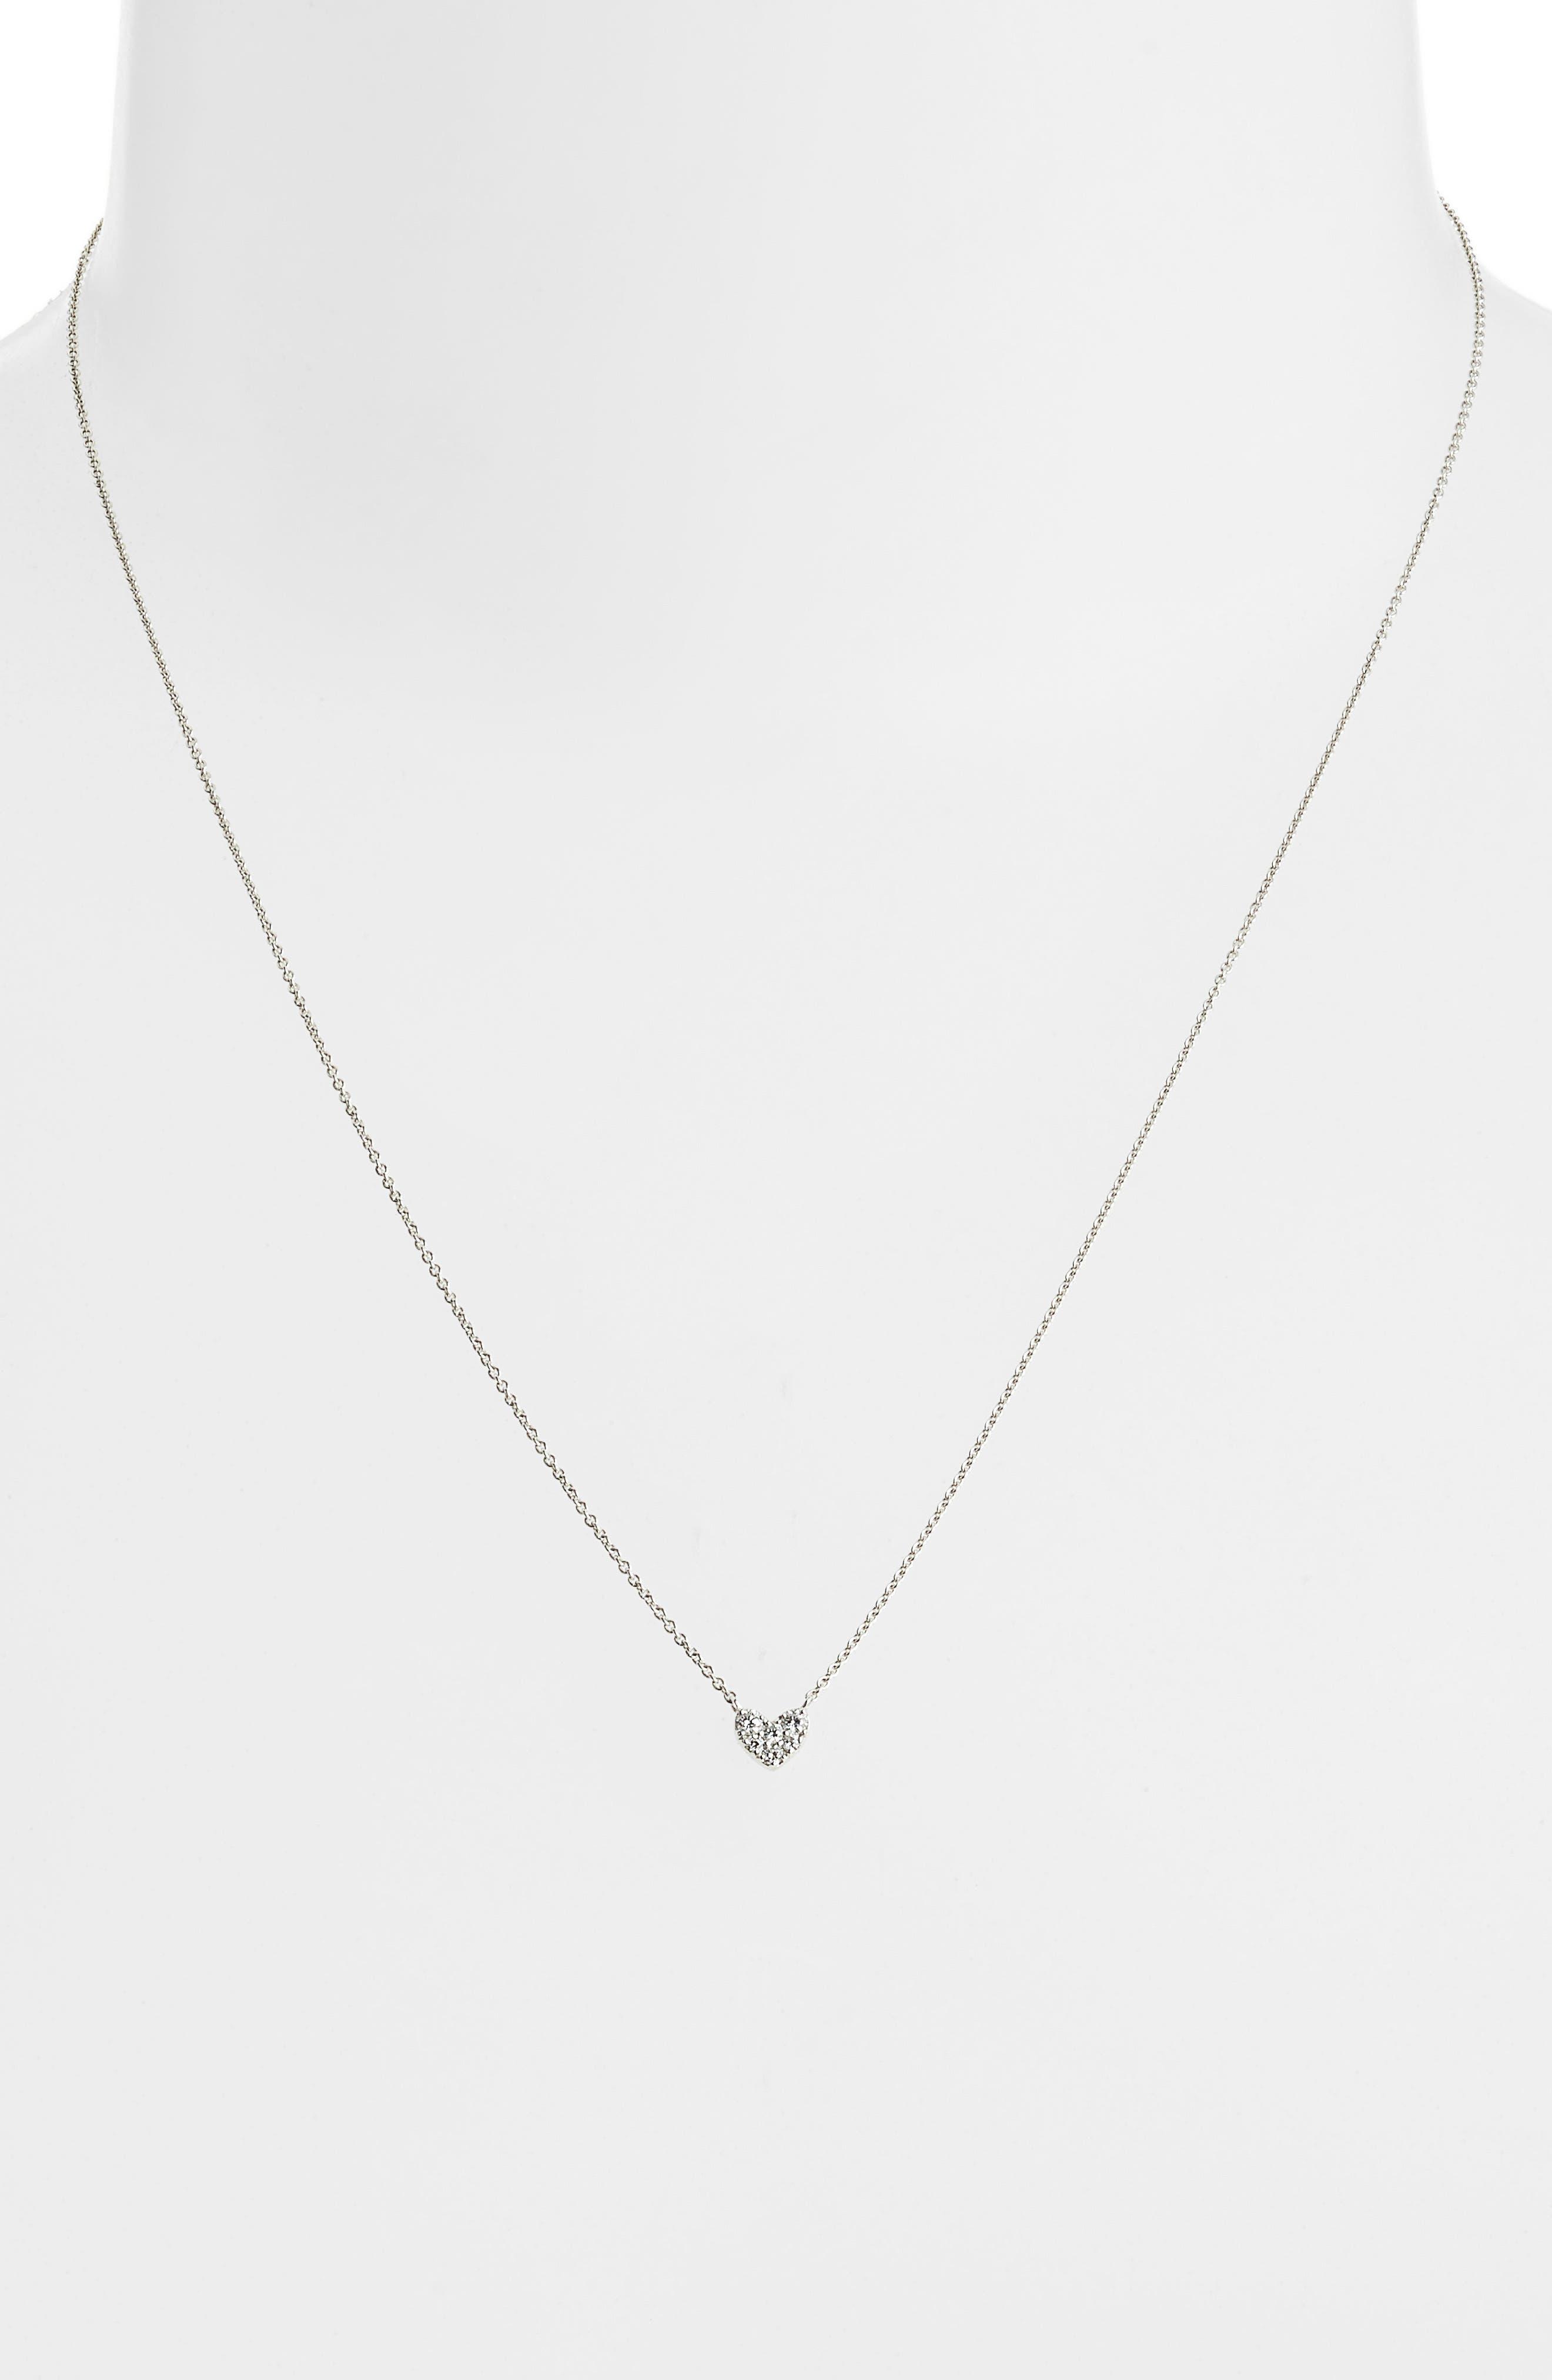 Pavé Diamond Heart Pendant Necklace,                             Alternate thumbnail 2, color,                             WHITE GOLD/ DIAMOND